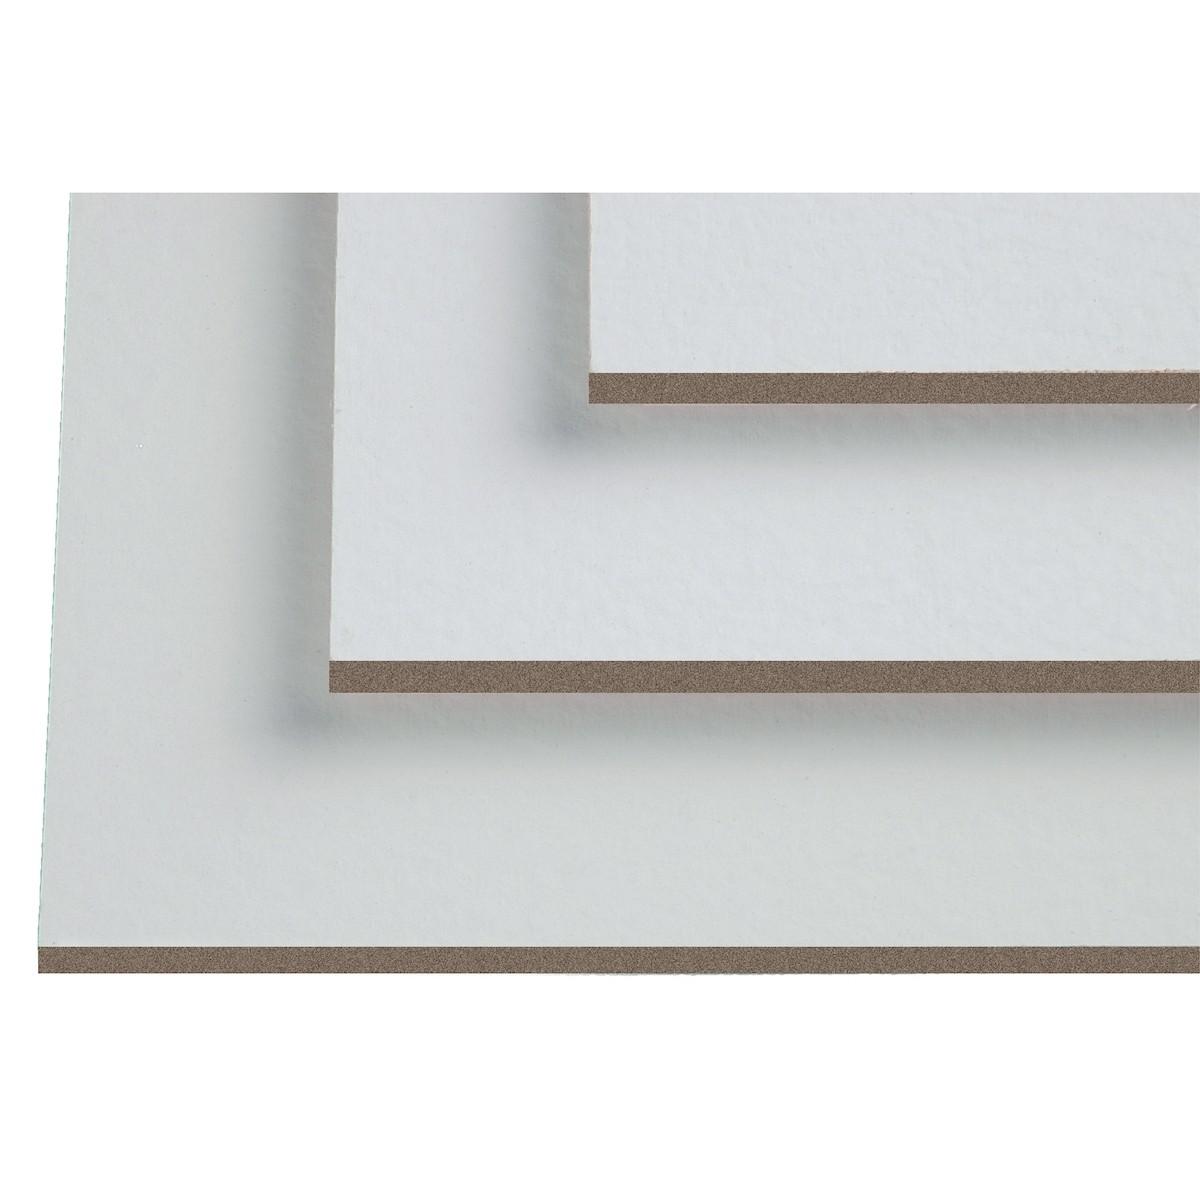 Maleplade m. lærred, 60 x 80